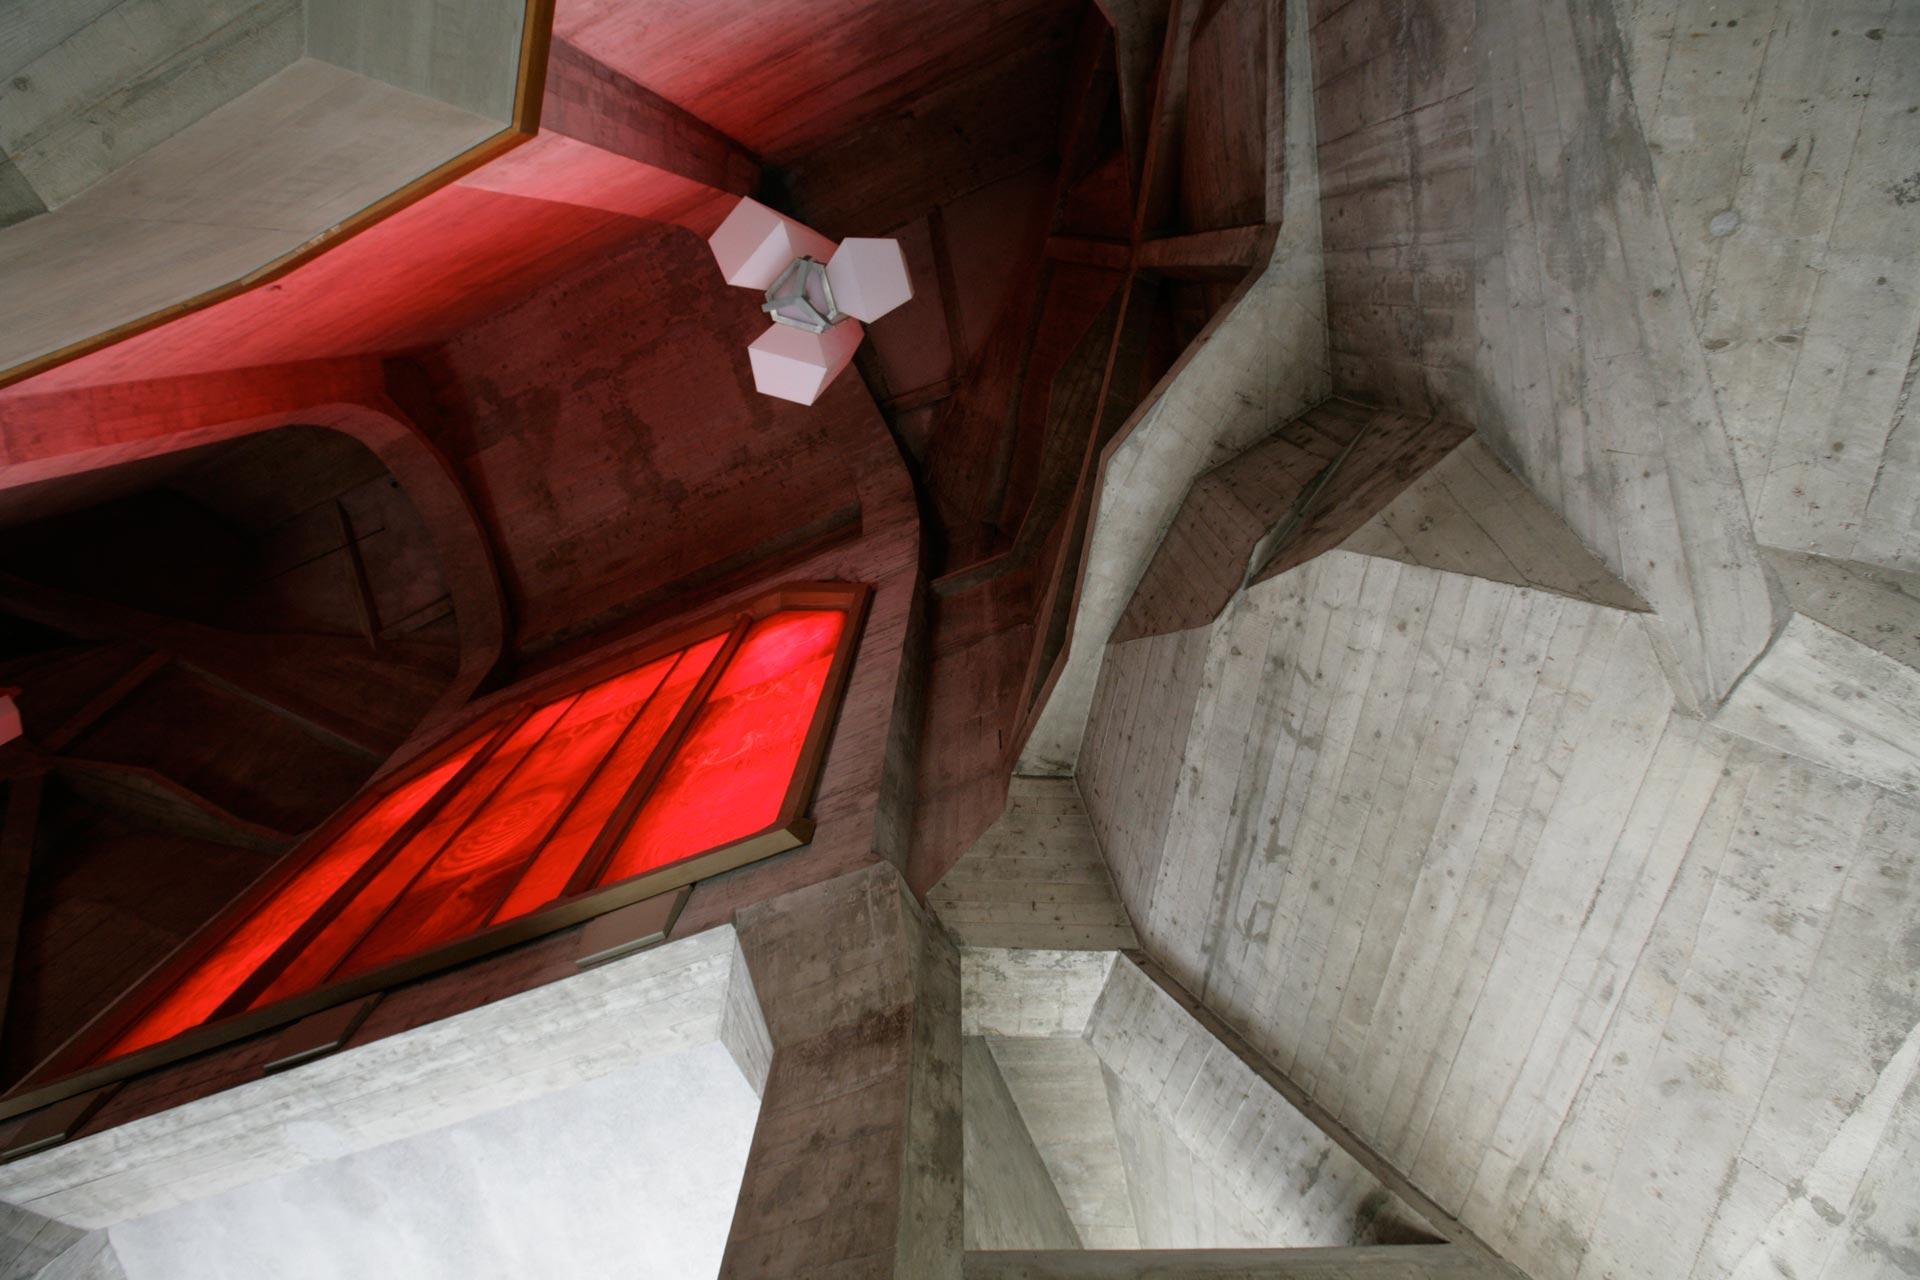 Westtreppenhaus mit Rotem Fenster – Western staircase with Red Window